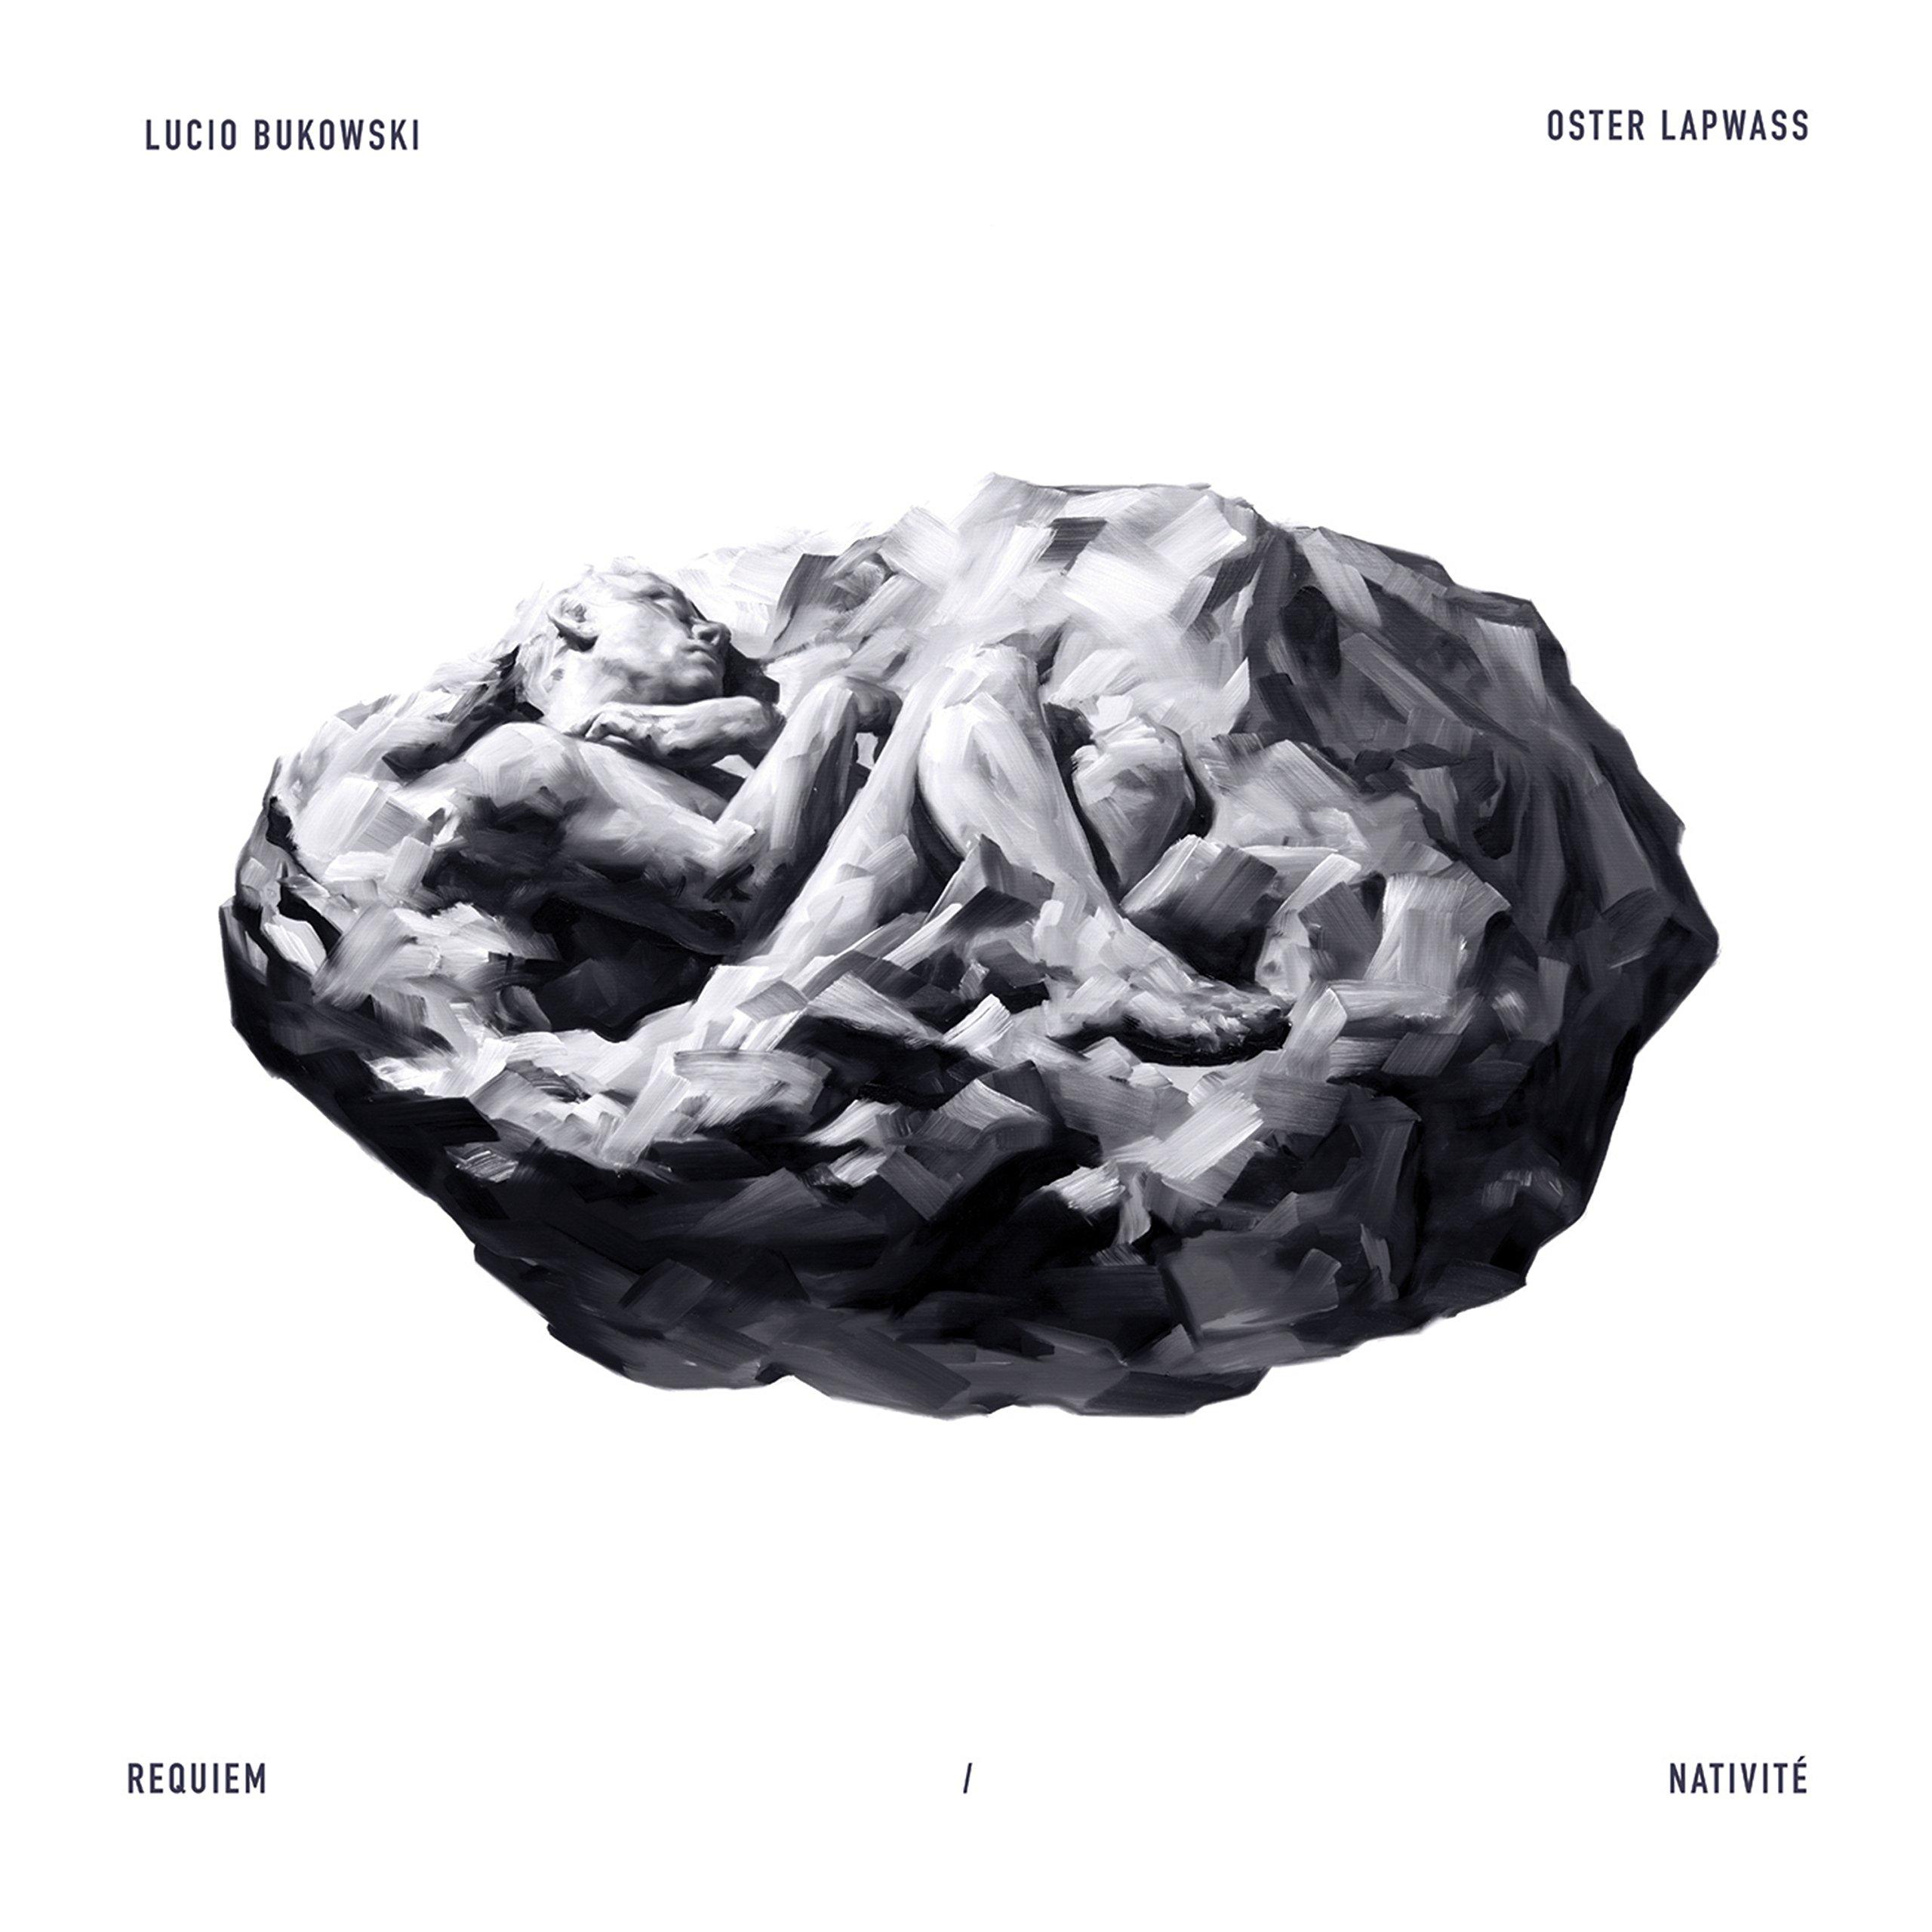 Lucio Bukowski et Oster Lapwass - Requiem / Nativite (2017) [FLAC] Download